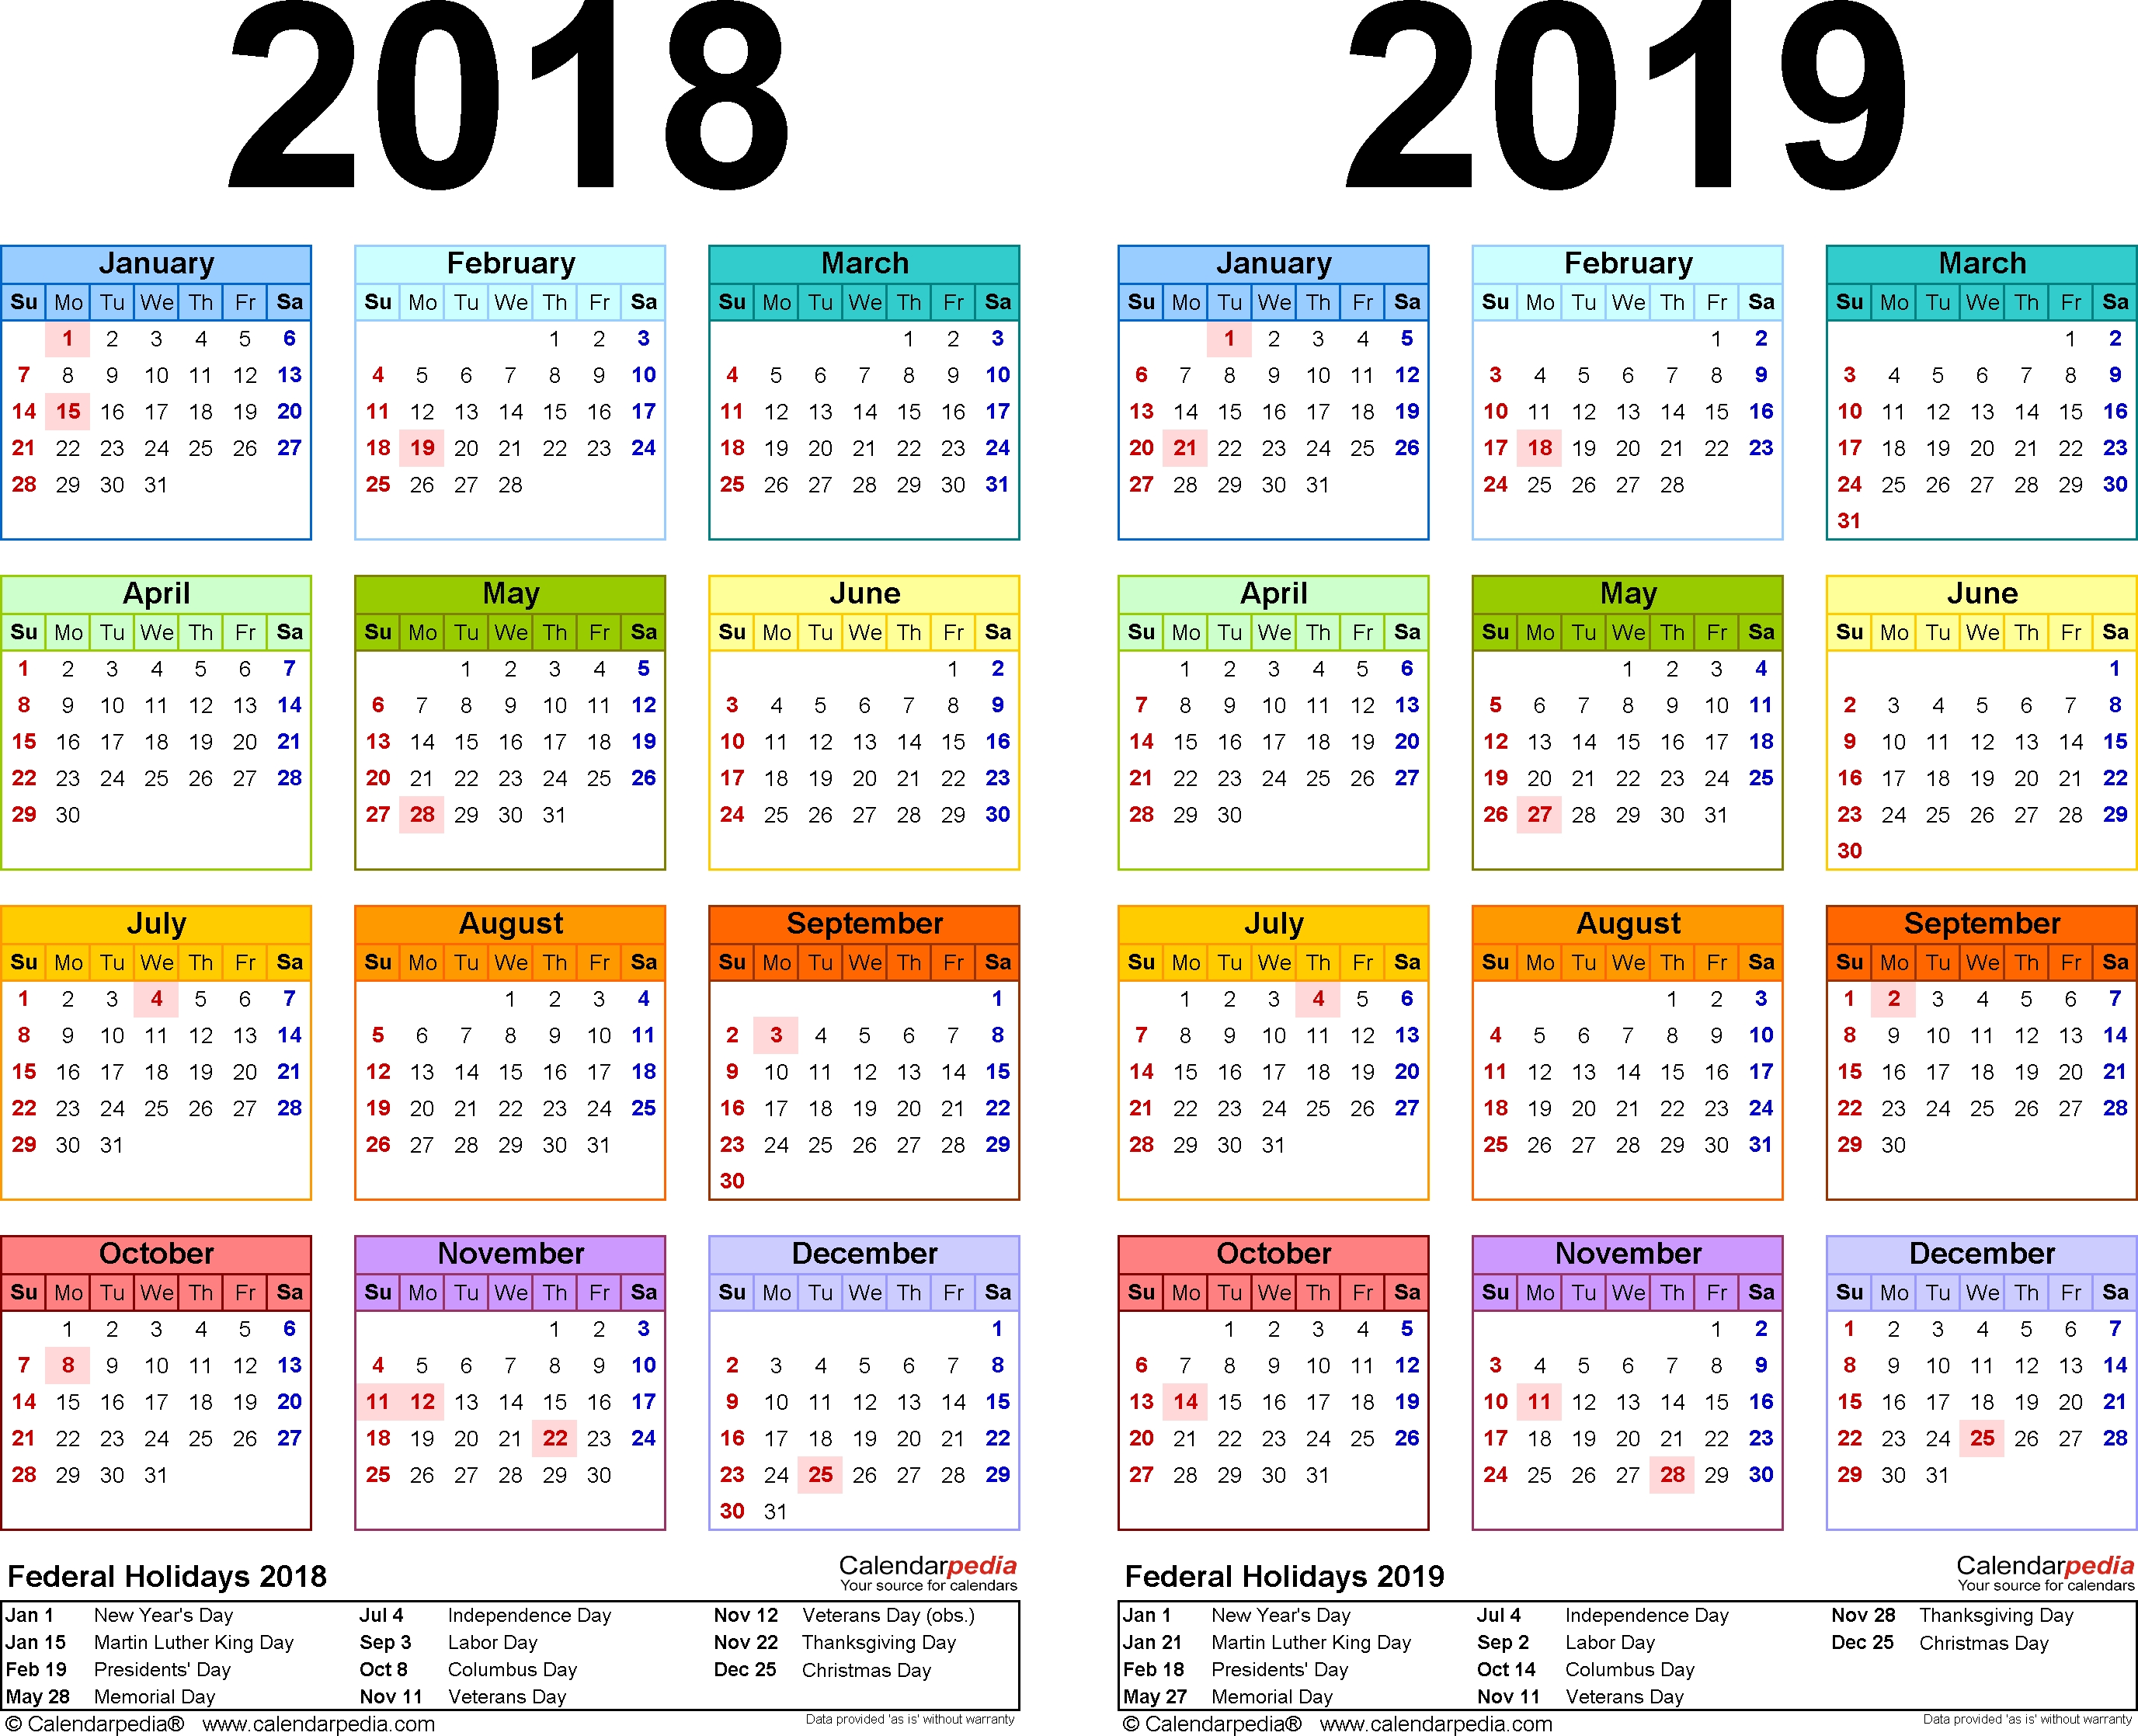 2018-2019 Calendar - Free Printable Two-Year Pdf Calendars inside U Of L 2019/2020 Calendar